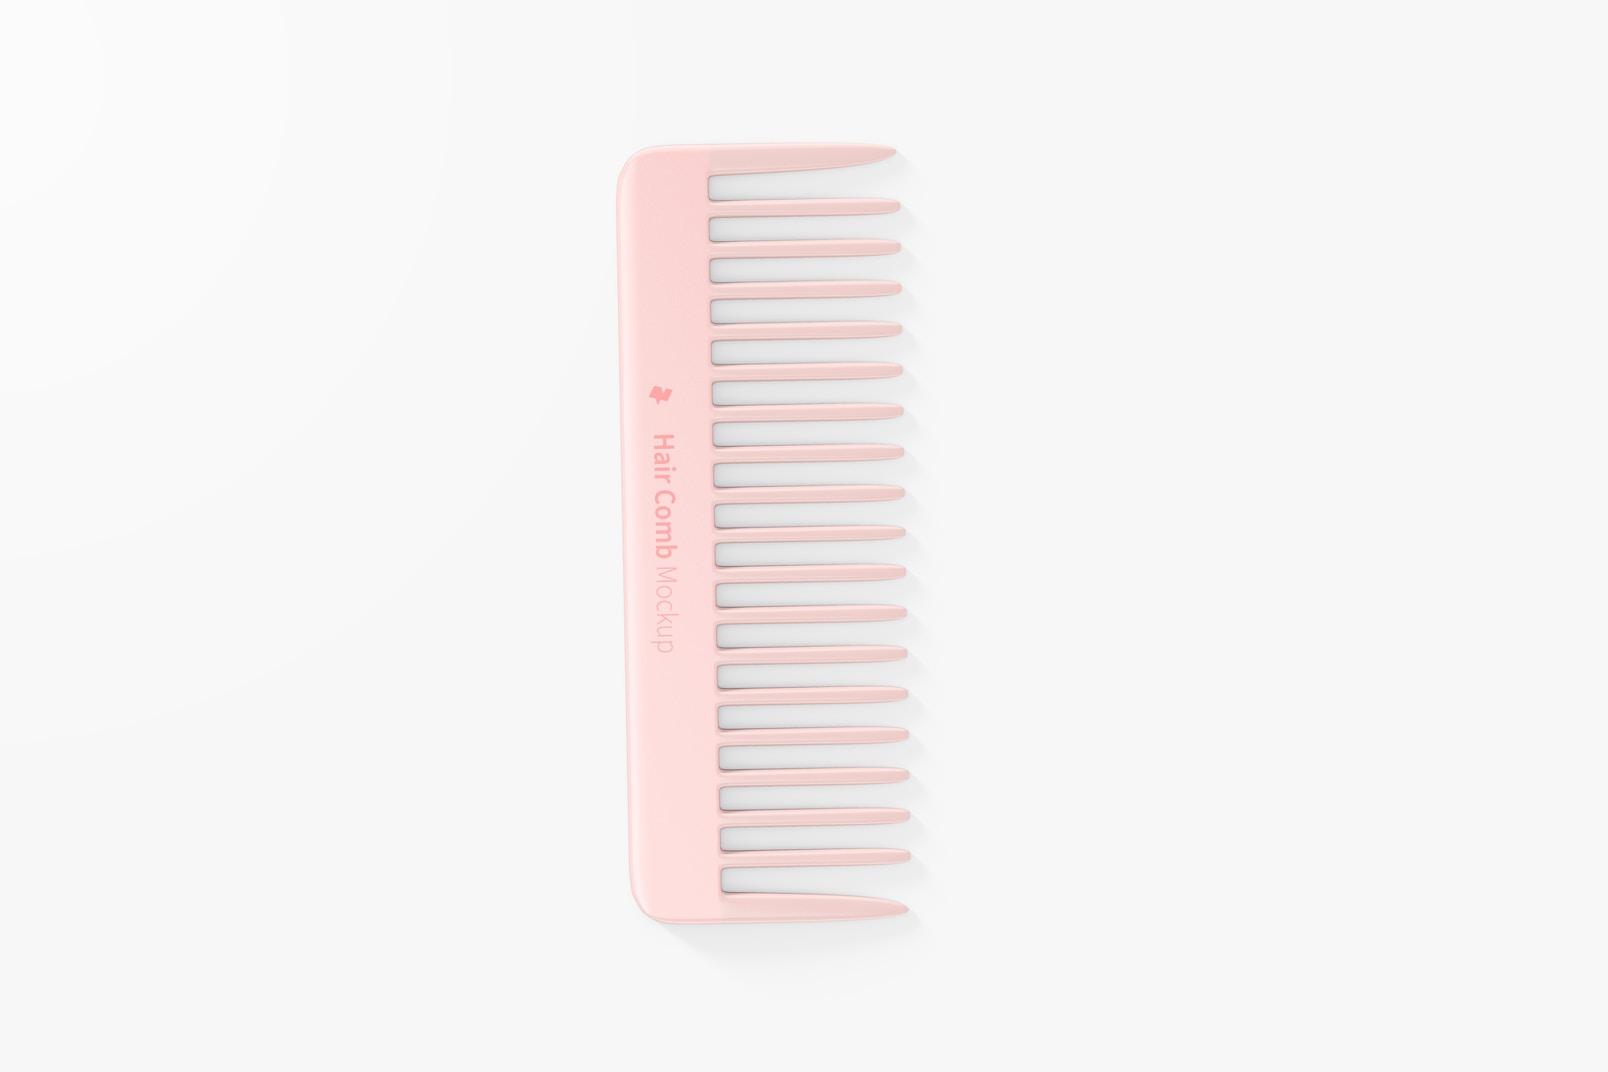 Hair Comb Mockup, Top View